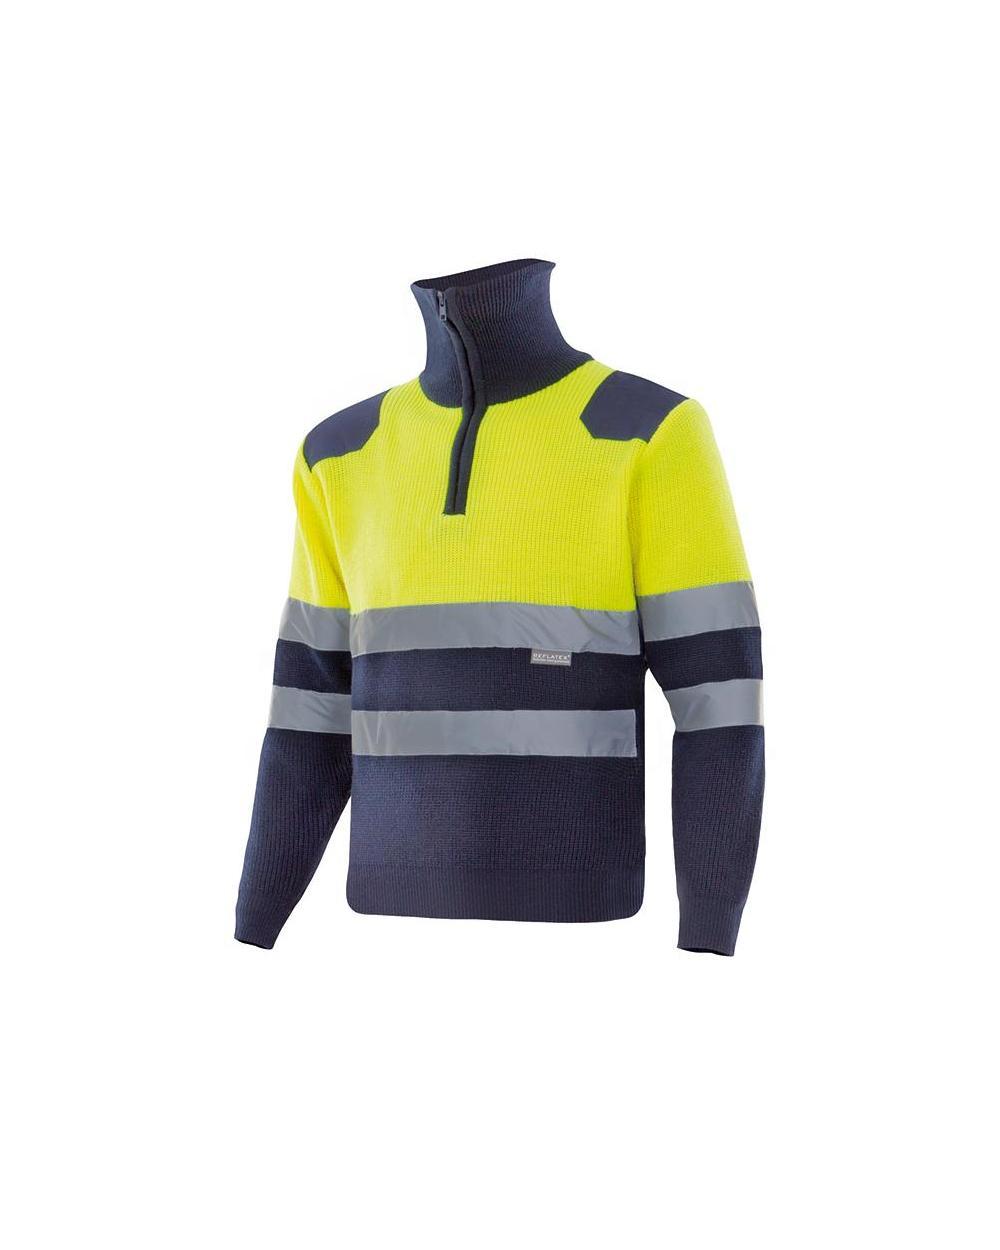 Comprar Jersey bicolor con cremallera alta visibilidad serie 301001 online barato Sup Ama/Inf Marino